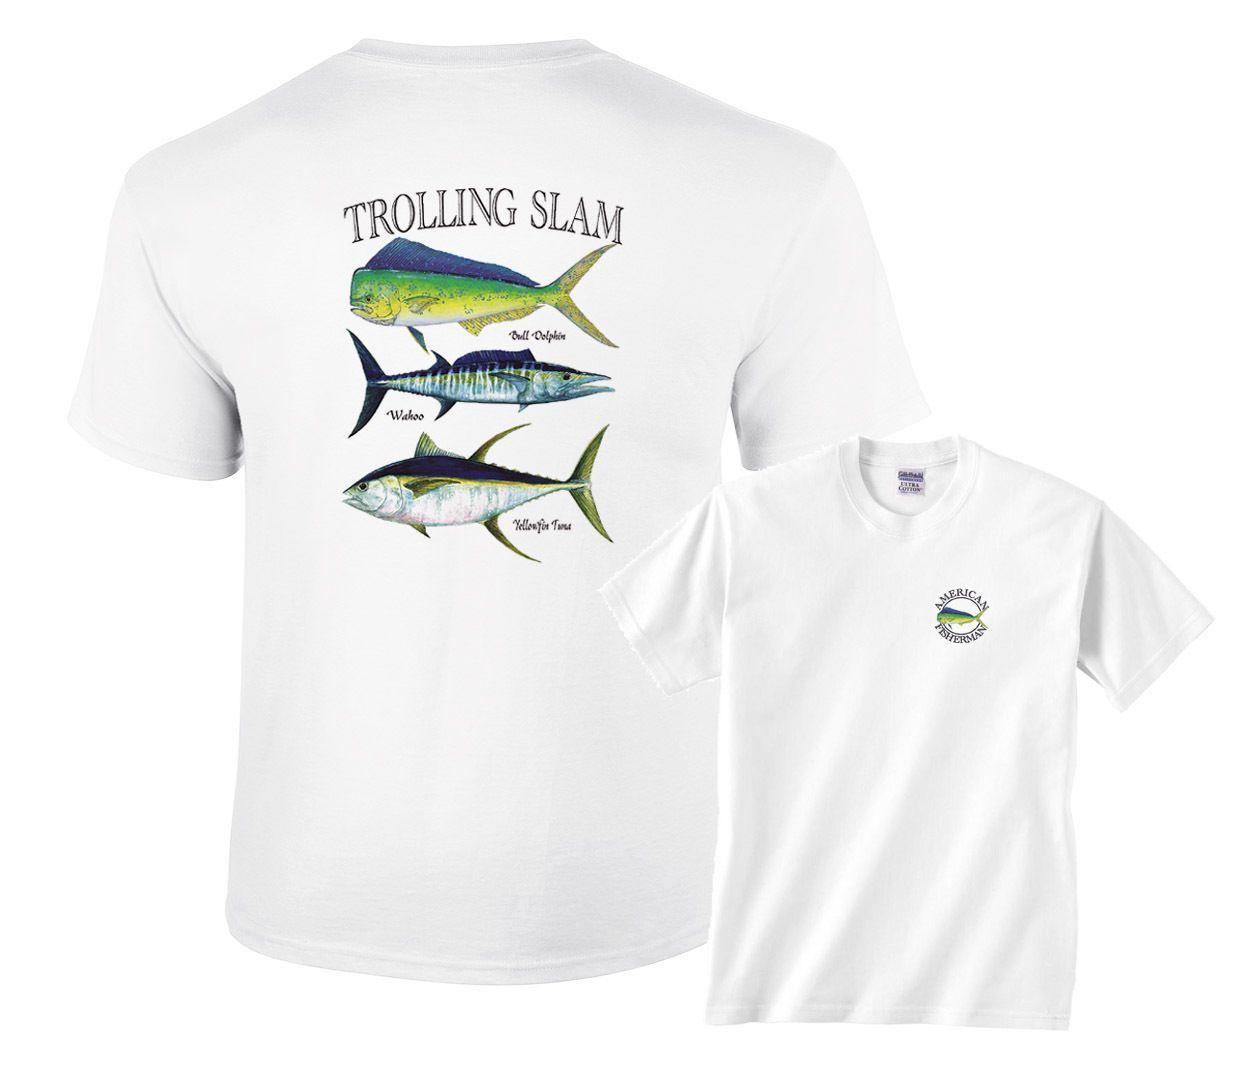 Trolling Slam Bull Dolphin Wahoo Yellowfin Tuna Fishing T-Shirt Cartoon t shirt men Unisex New Fashion tshirt free shipping top